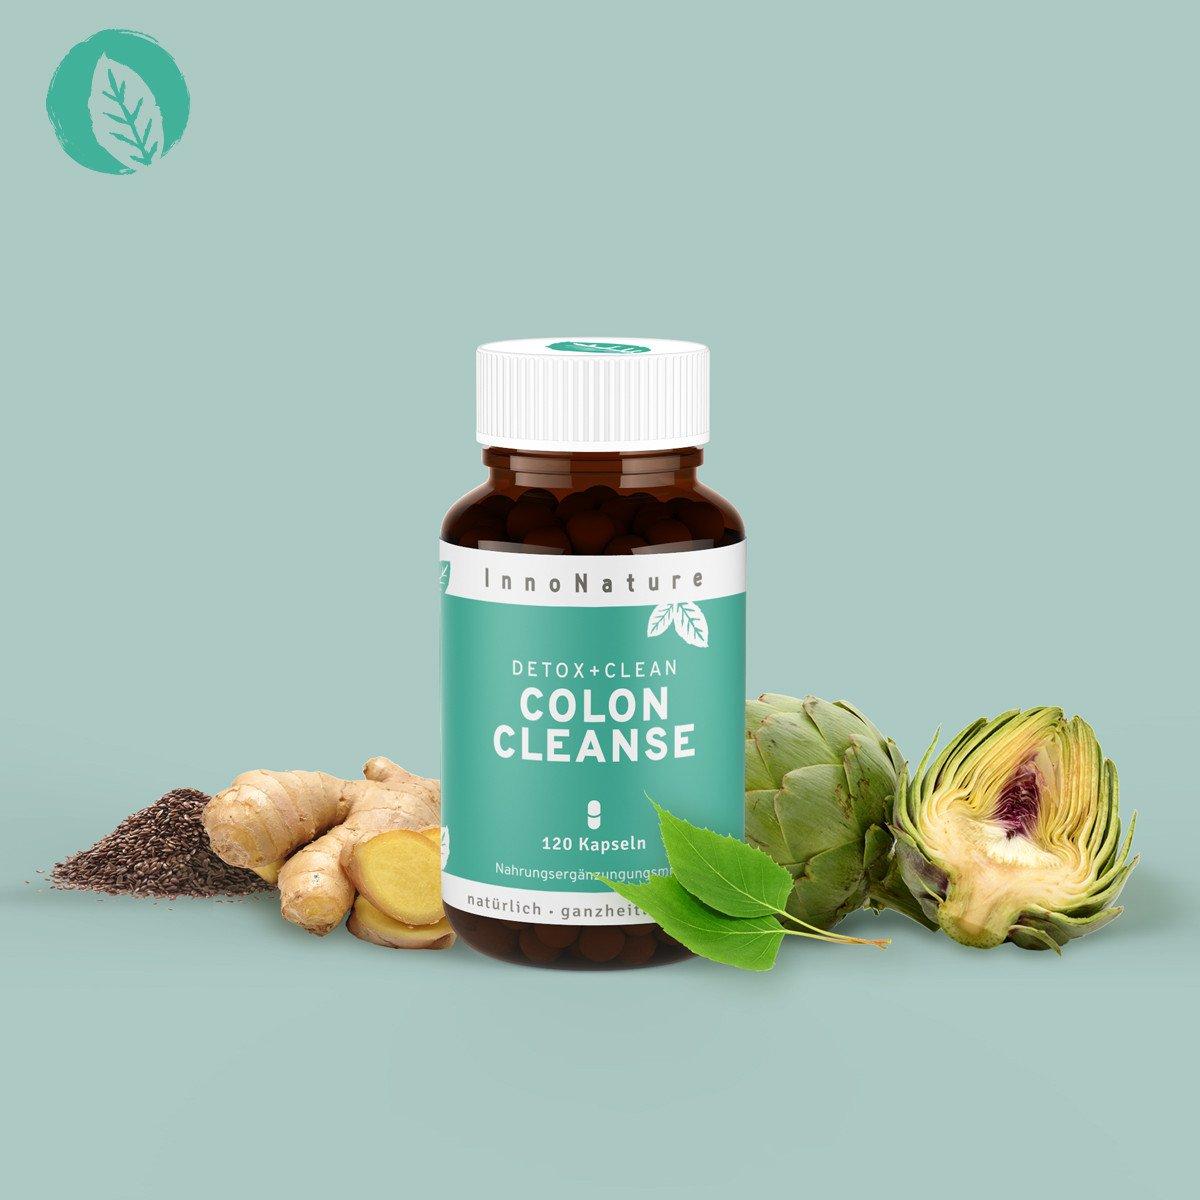 vegane Nahrungsergänzungsmittel - Colone Cleanse InnoNature